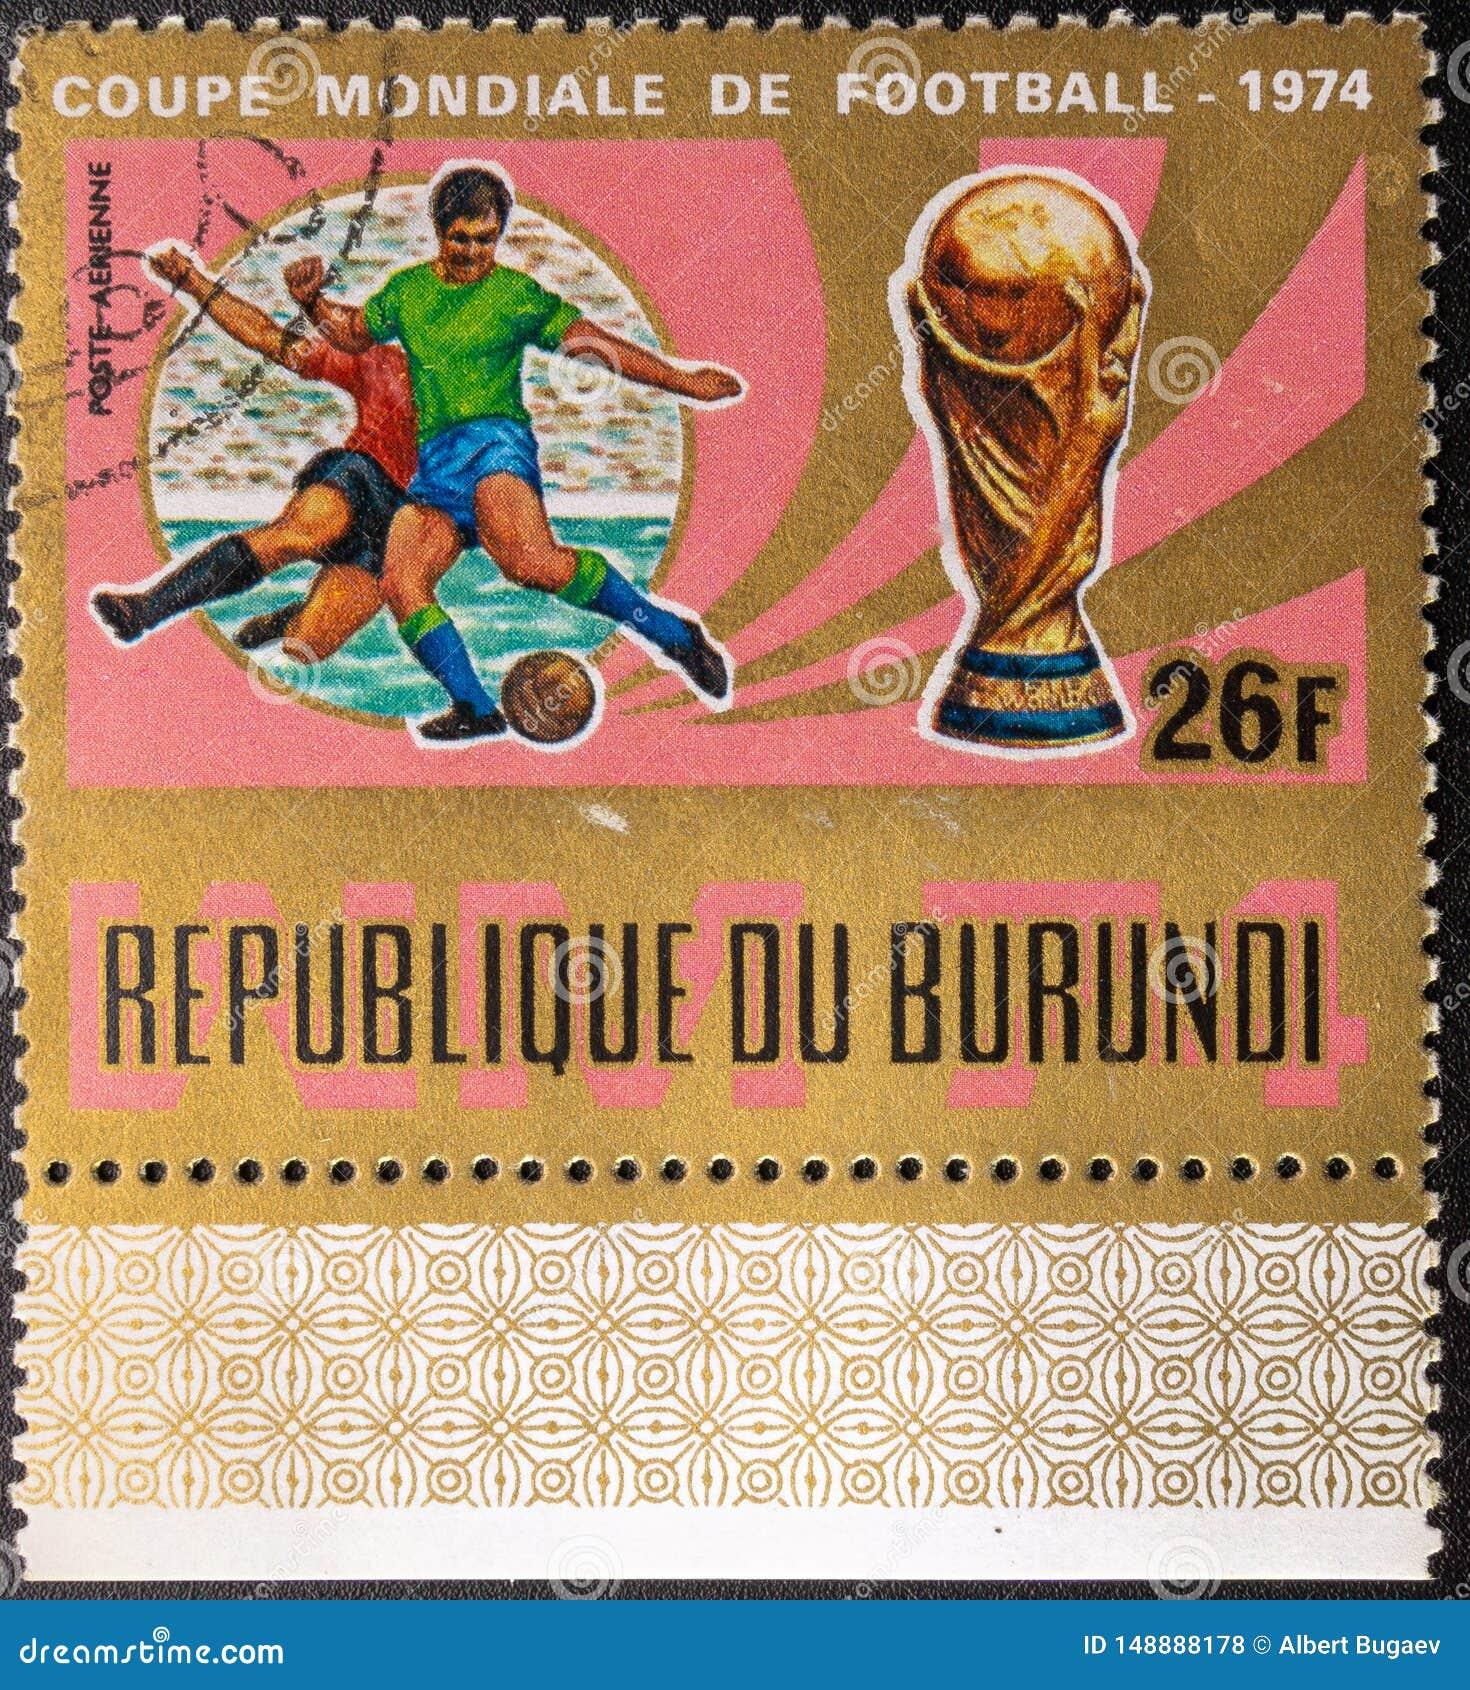 Postage Stamp. 1974. World Cup. Soccer. Republic of Burundi